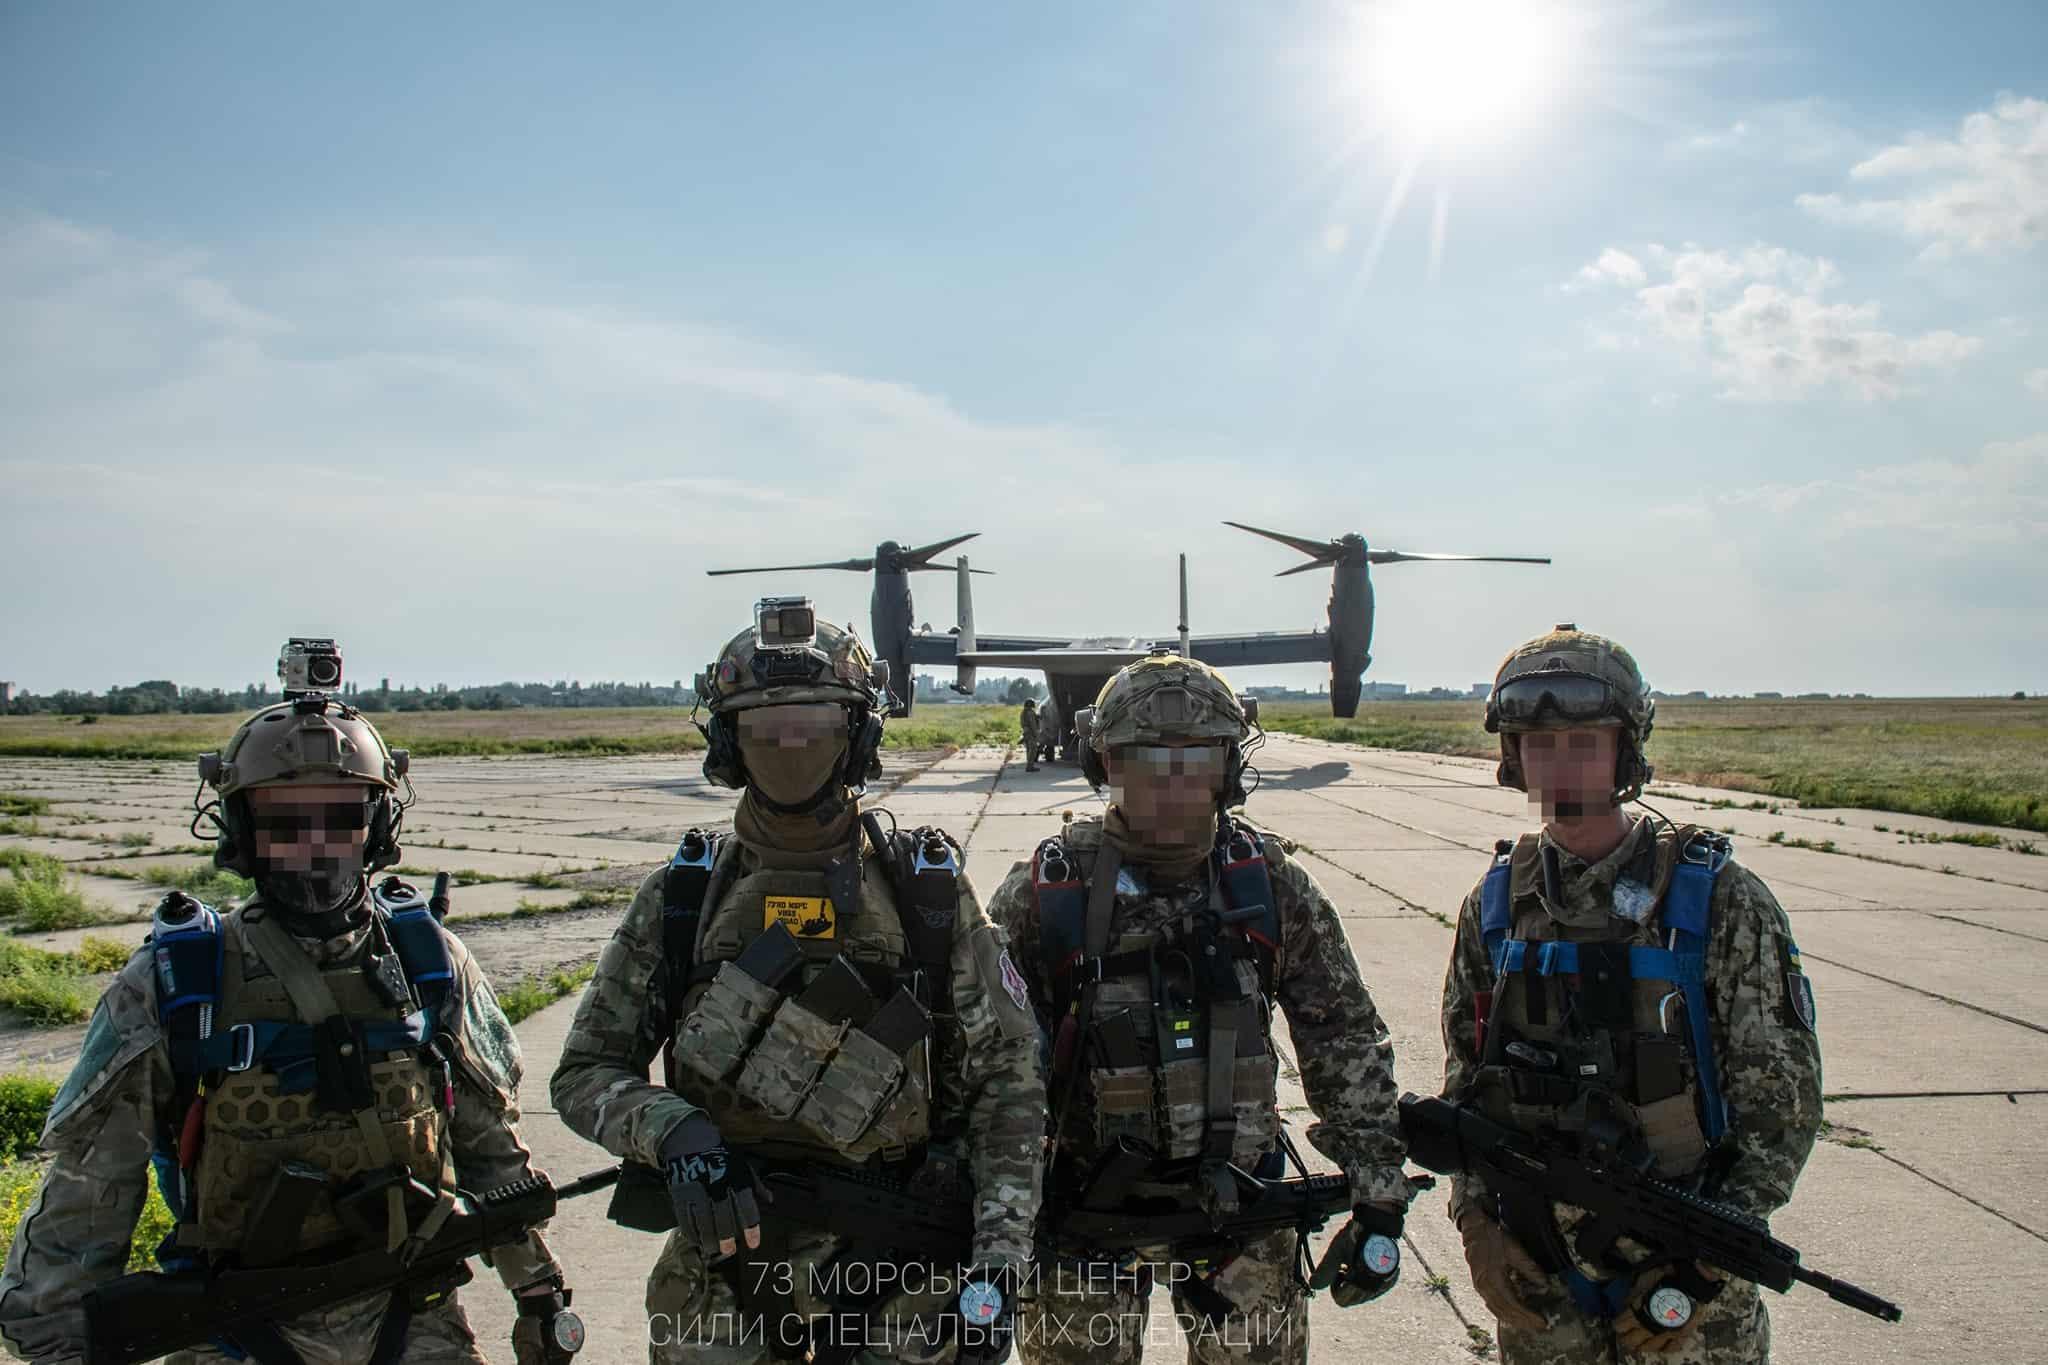 Оператори ССО України та конвертоплан V-22 Osprey